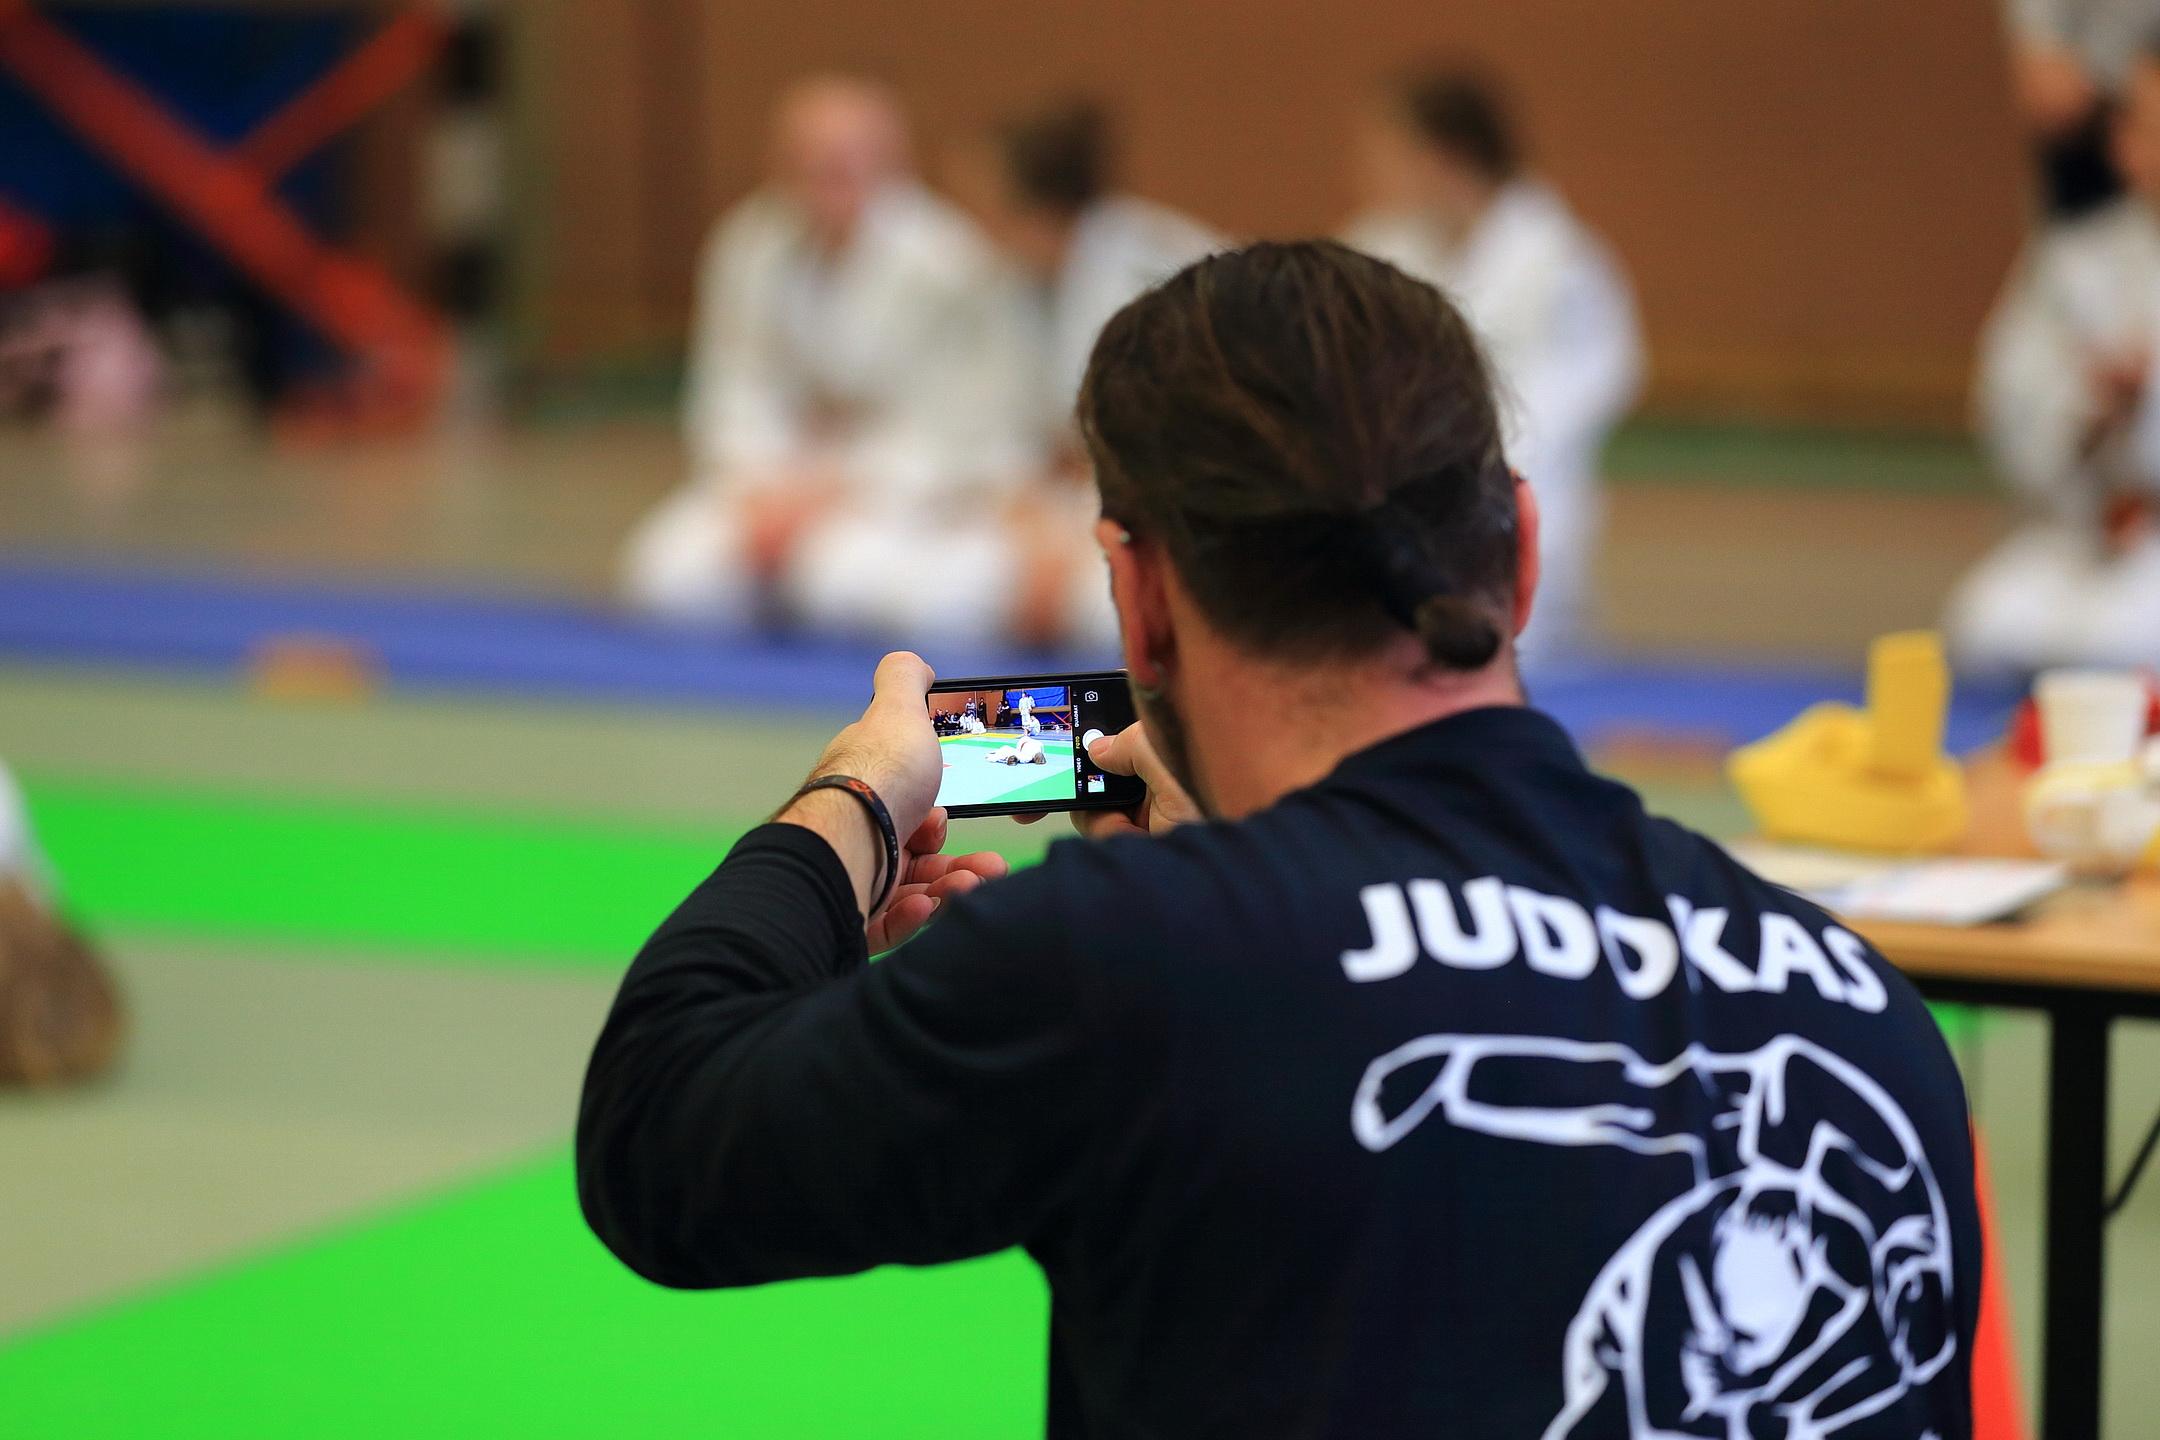 2016-Nikolausturnier Judokas Schwedt (40)